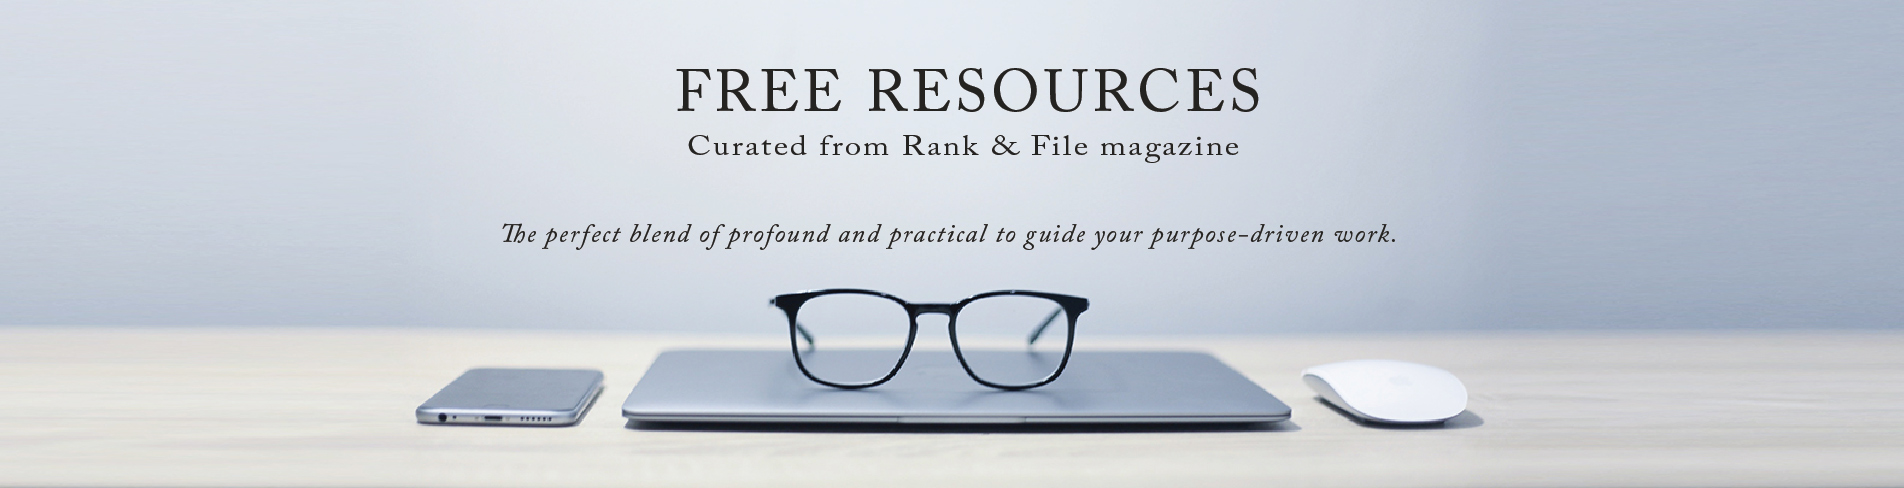 Free Resources for Social Enterprise, Social Entrepreneurs, Conscious Company and Purpose-driven Businesses